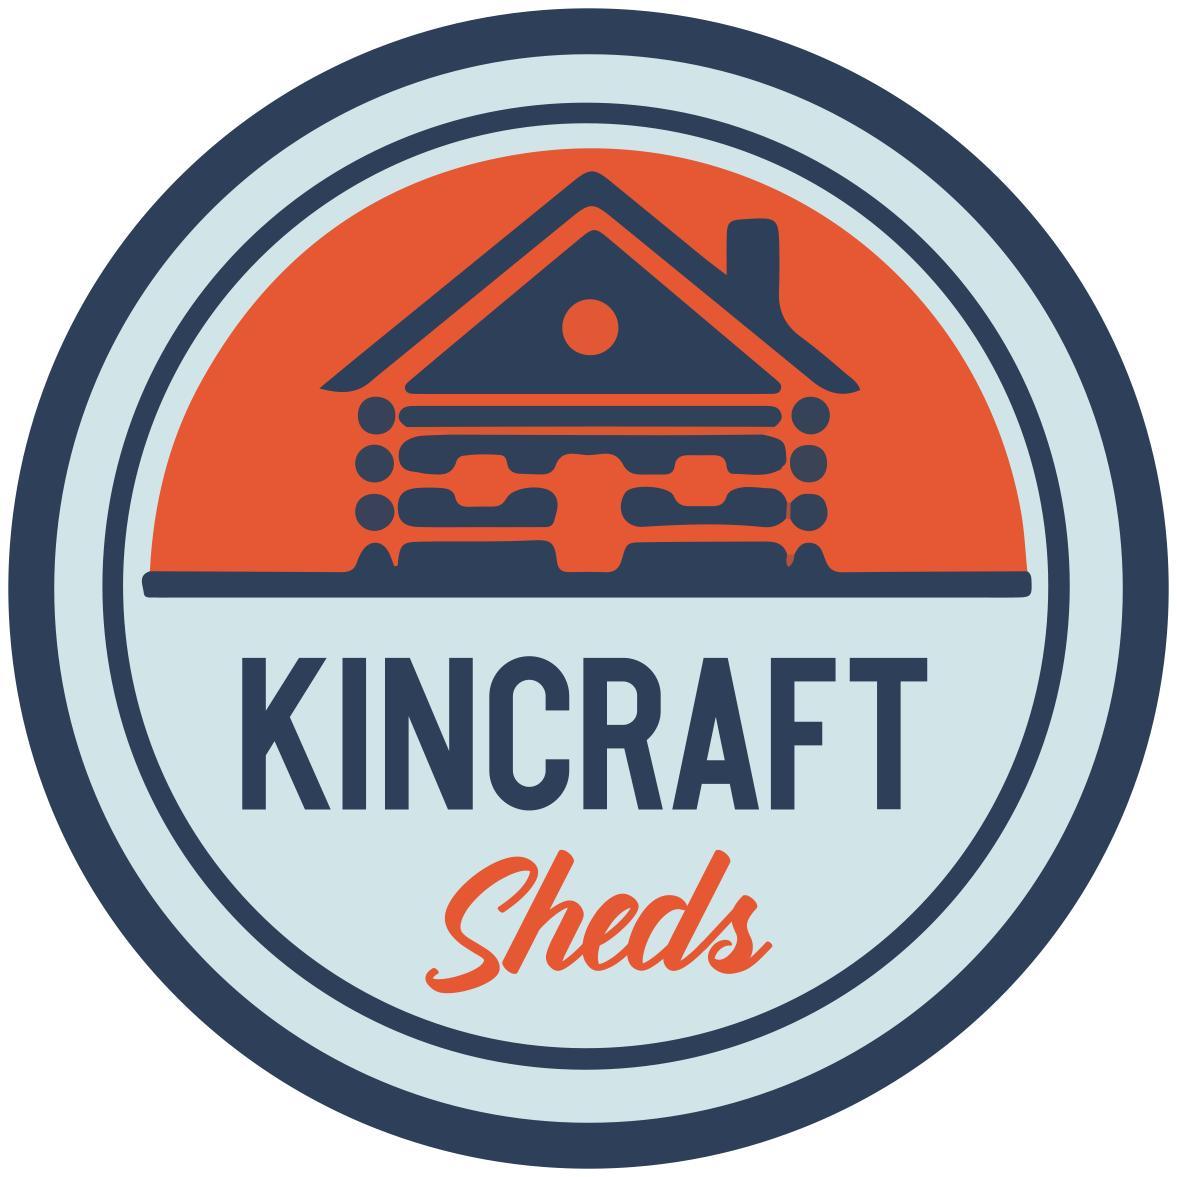 Kincraft Sheds   storage   900 Lady Ellen Pl, Ottawa, ON K1Z 5L5, Canada   6138051879 OR +1 613-805-1879